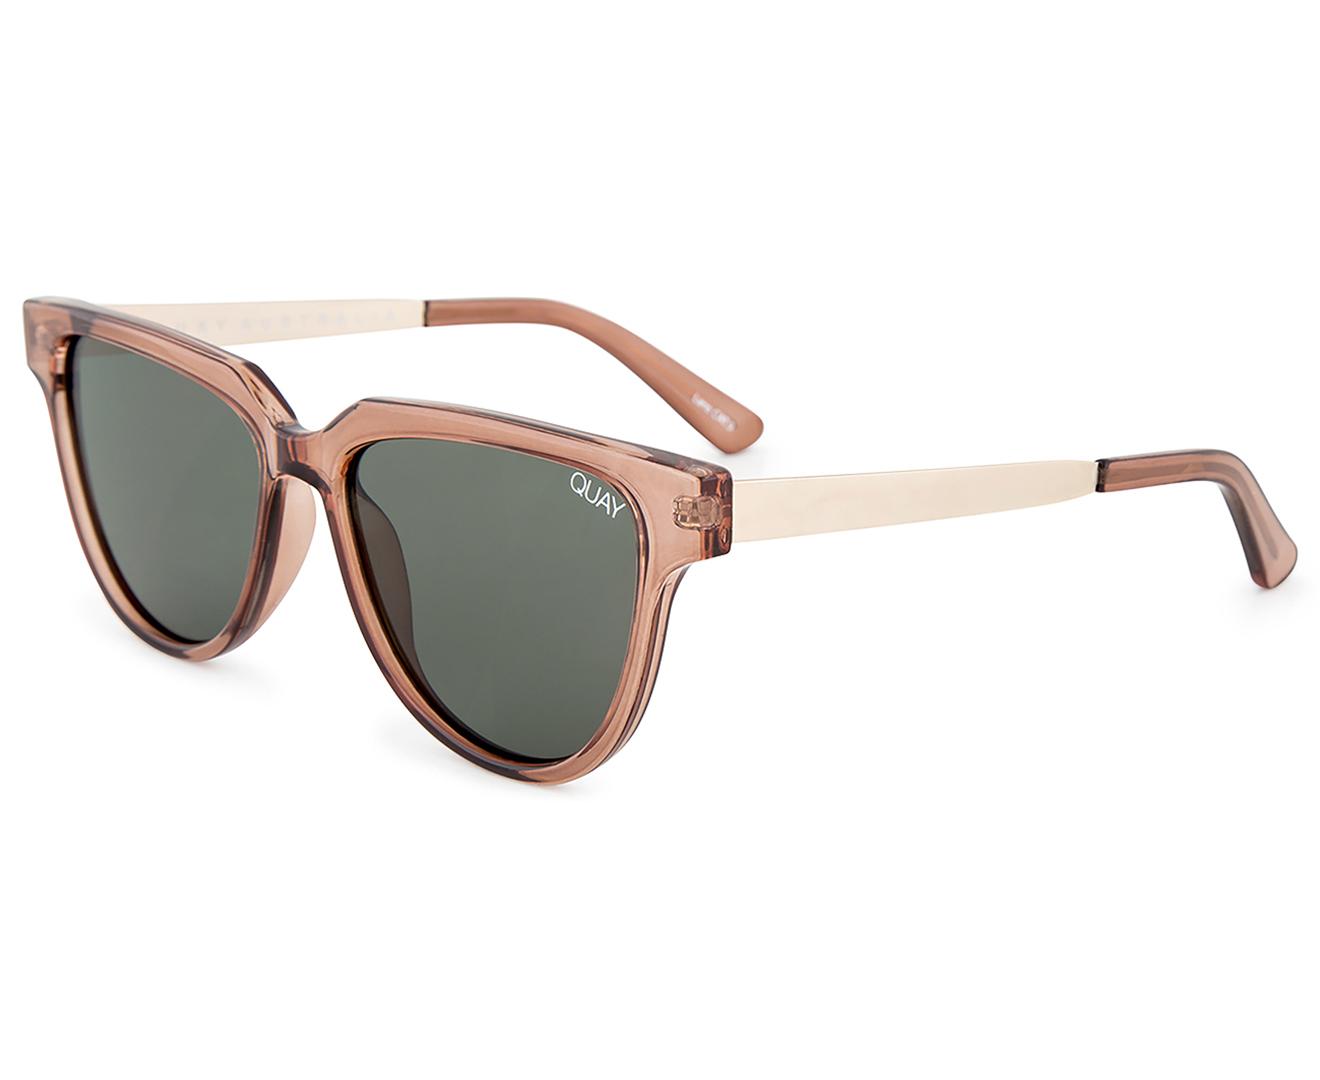 0b30d62eb9b Quay Australia Women s Prime Time Sunglasses - Toffee Green